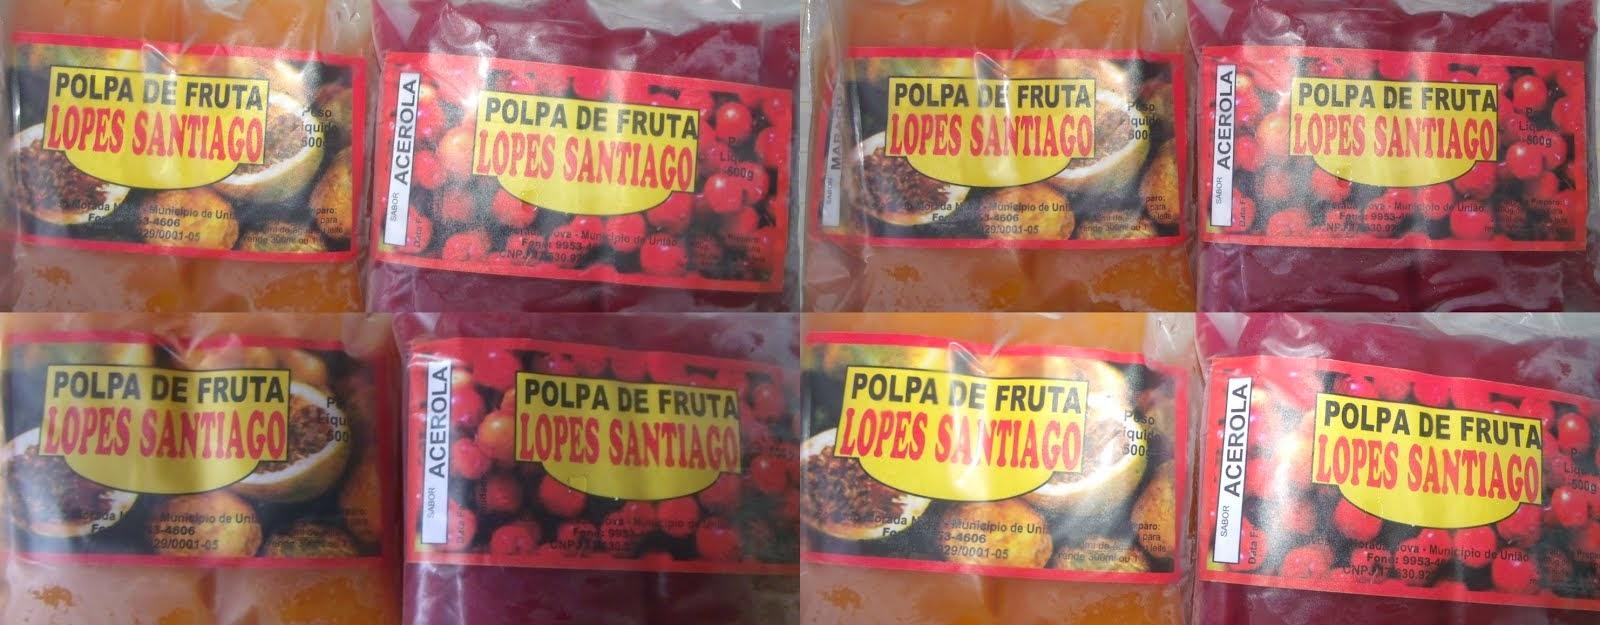 Polpa de Fruta: Lopes Santiago